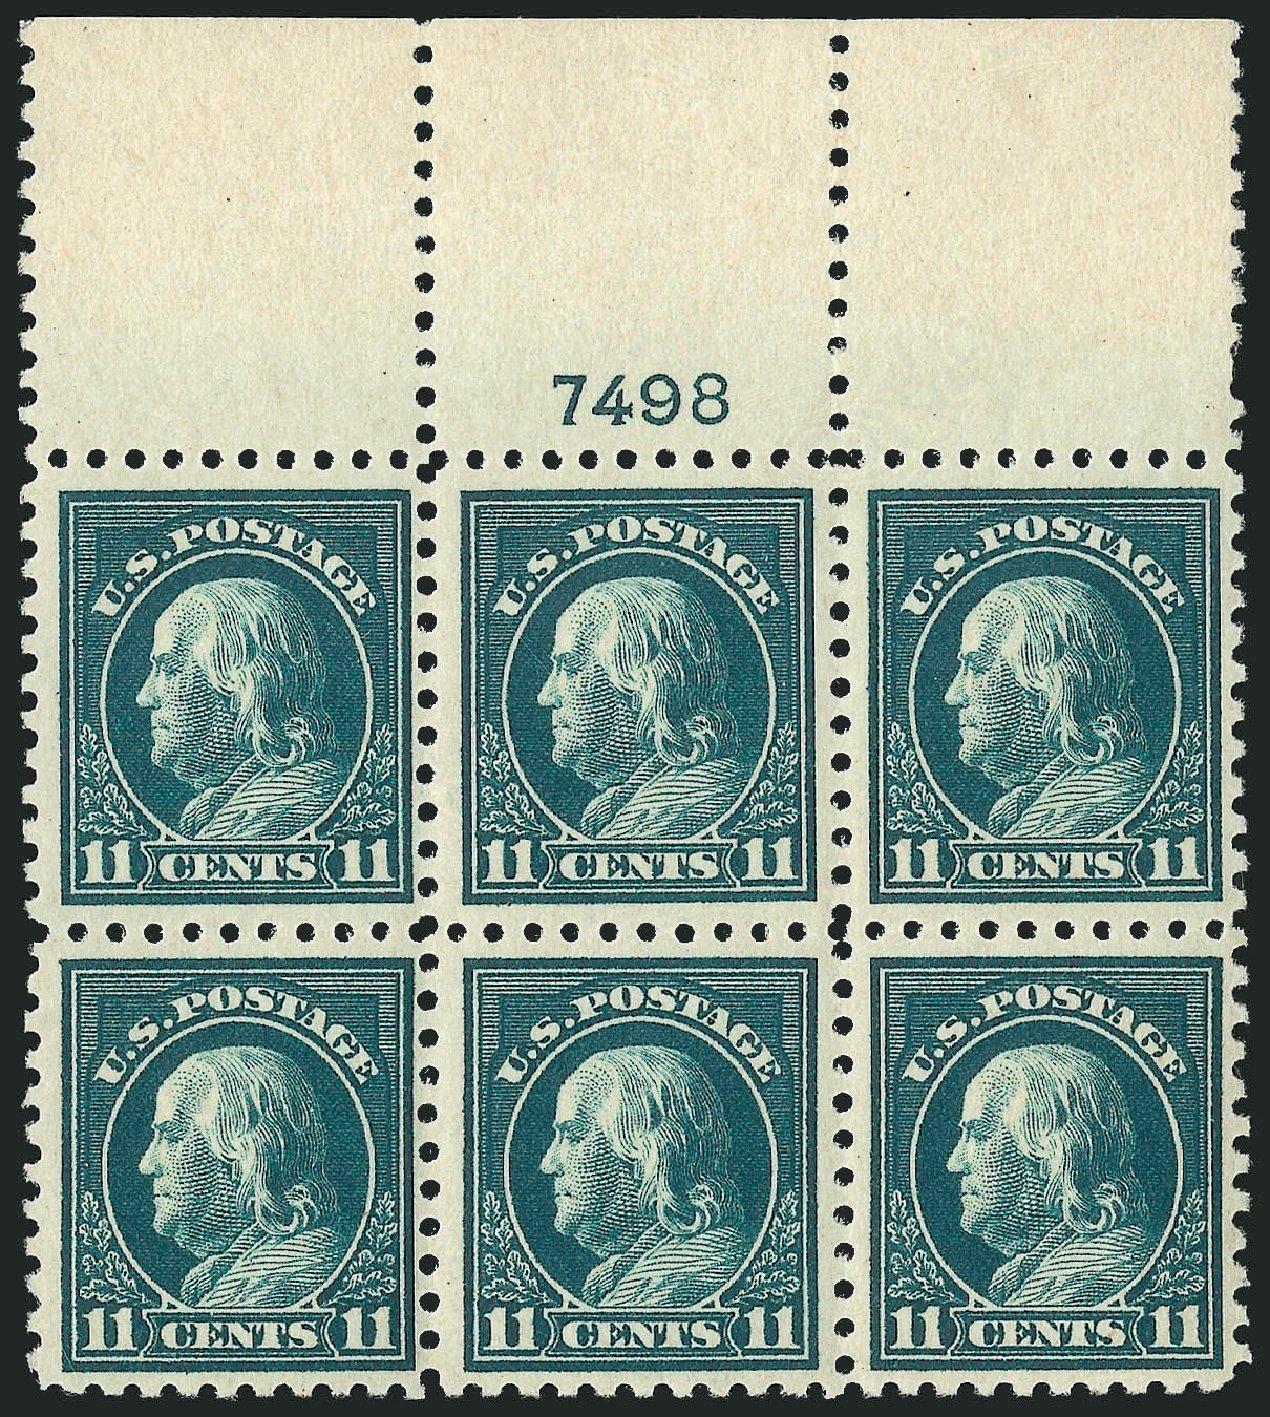 Costs of US Stamps Scott Catalog # 473: 11c 1916 Franklin Perf 10. Robert Siegel Auction Galleries, Feb 2015, Sale 1093, Lot 401